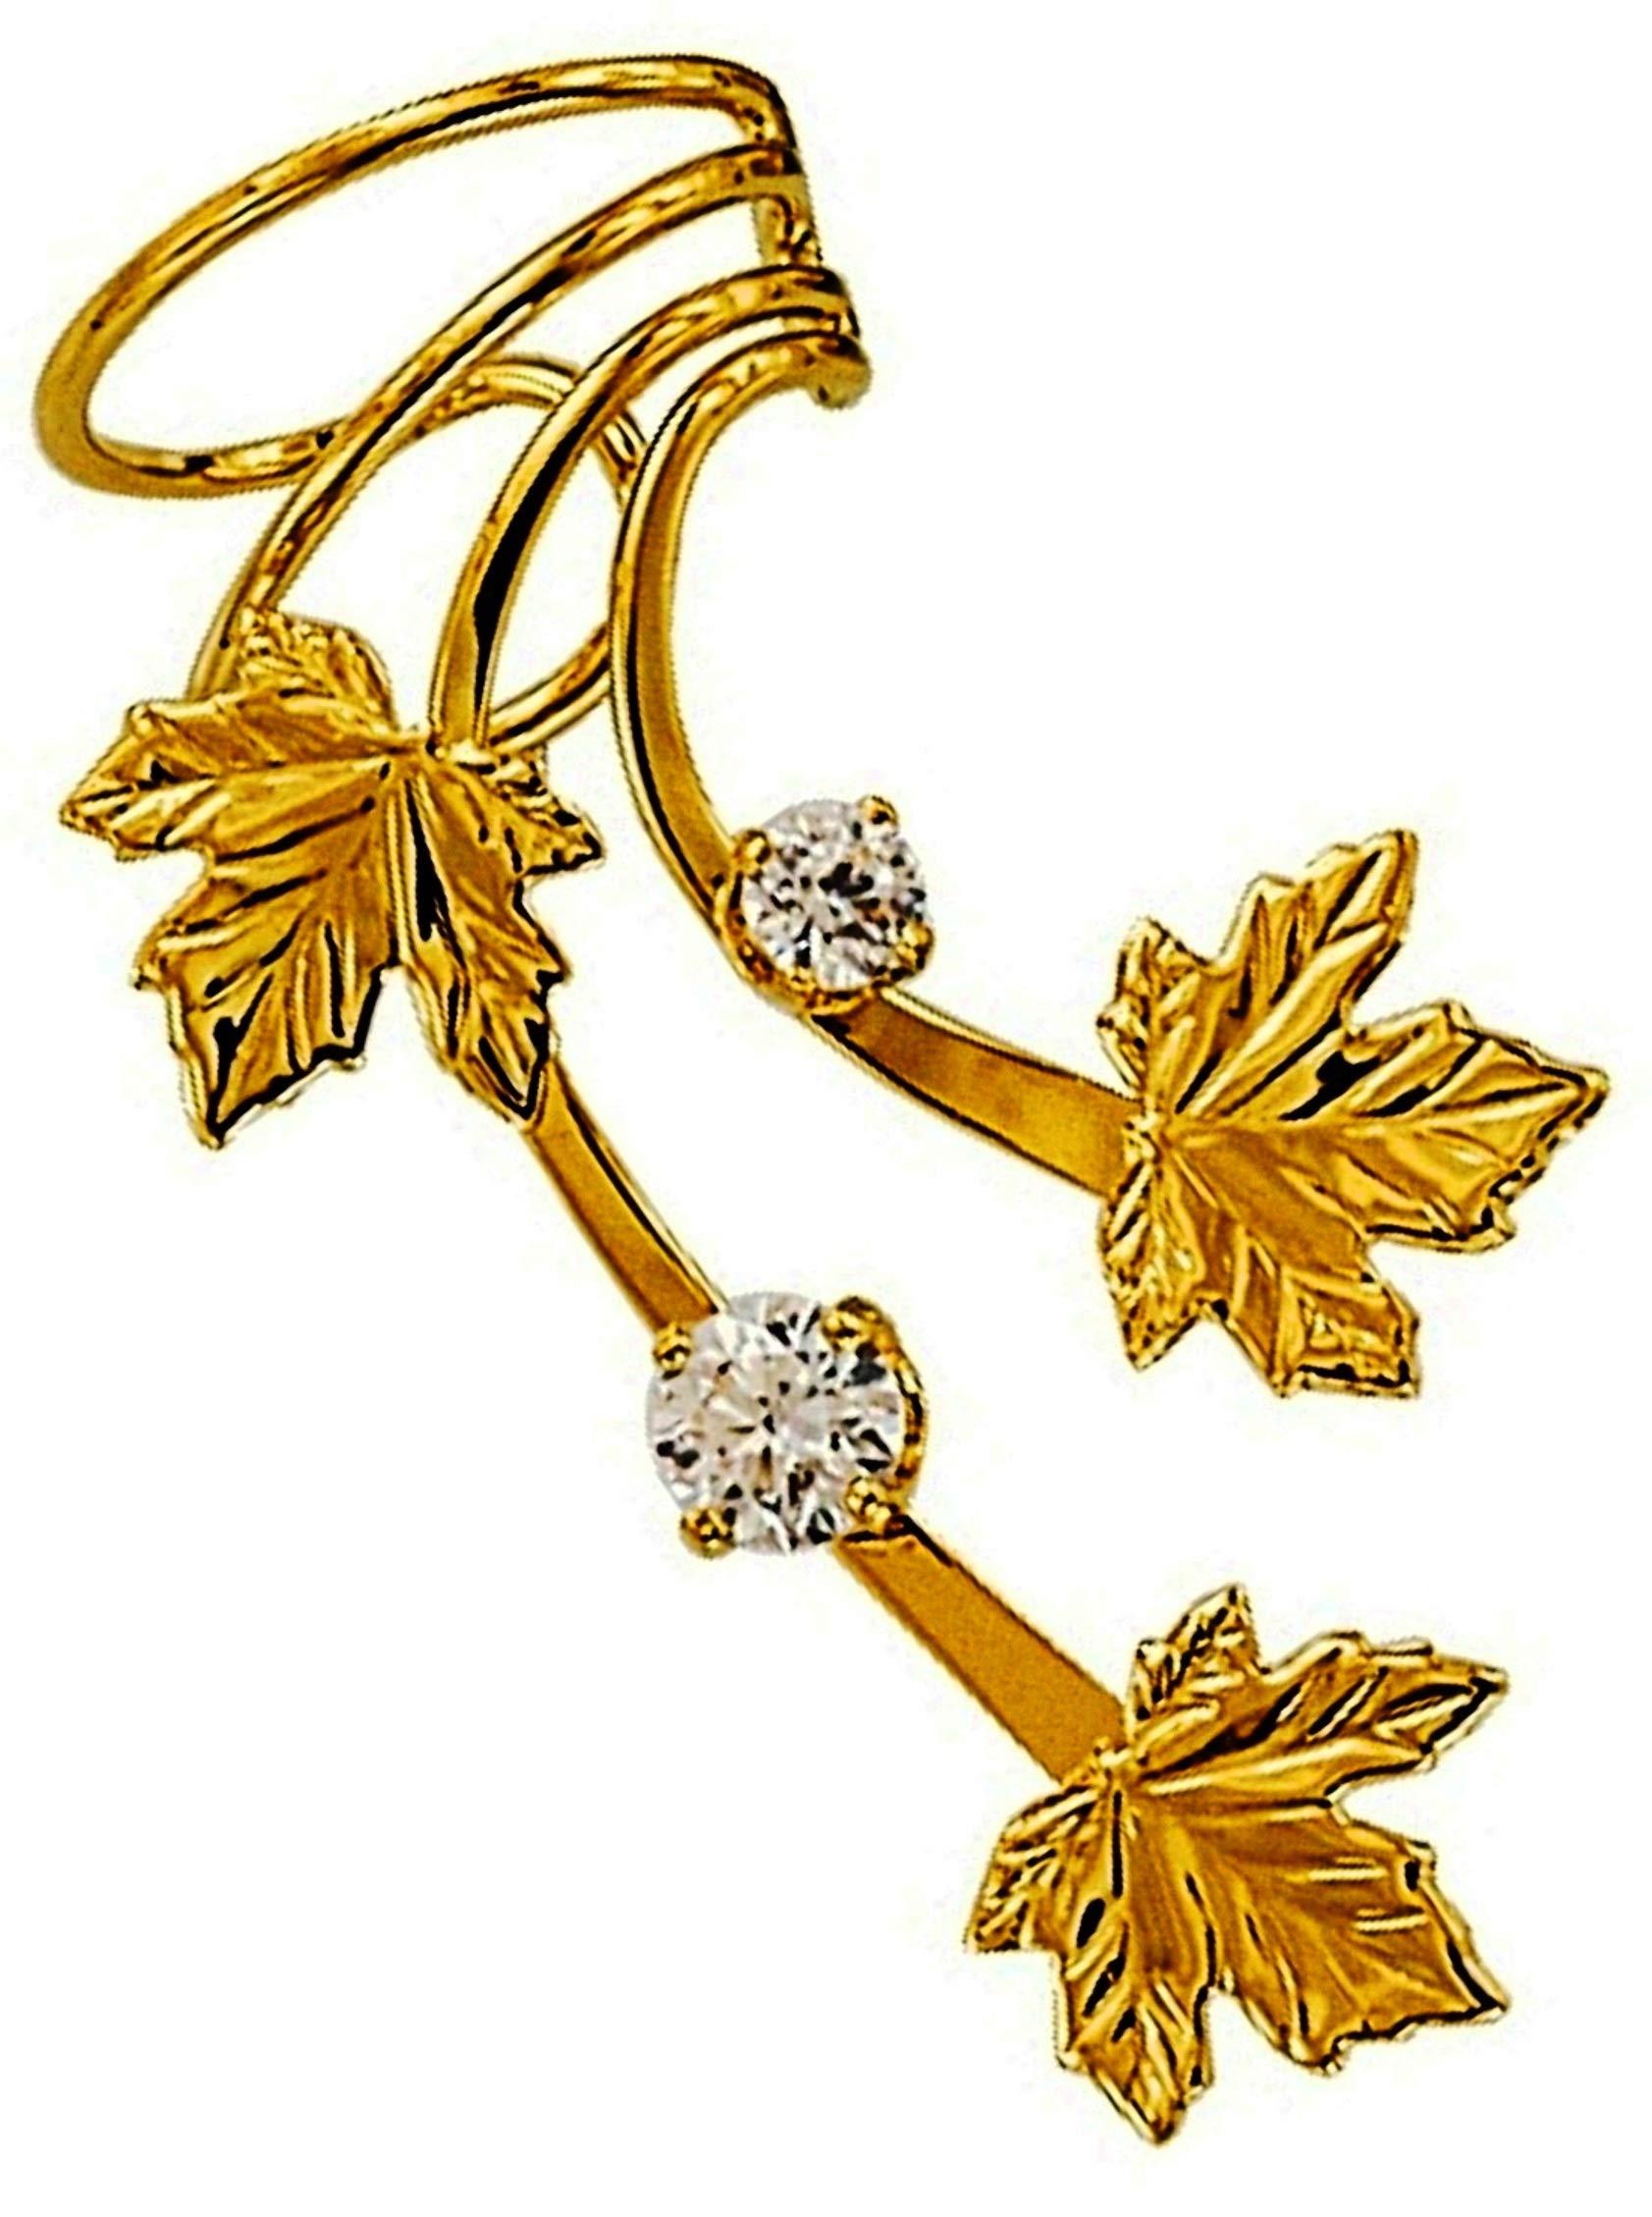 Ear Charms Maple 3 Leaf 2 CZ Long Wave Ear Cuff Non-pierced Right Earring Wrap Gold on Silver